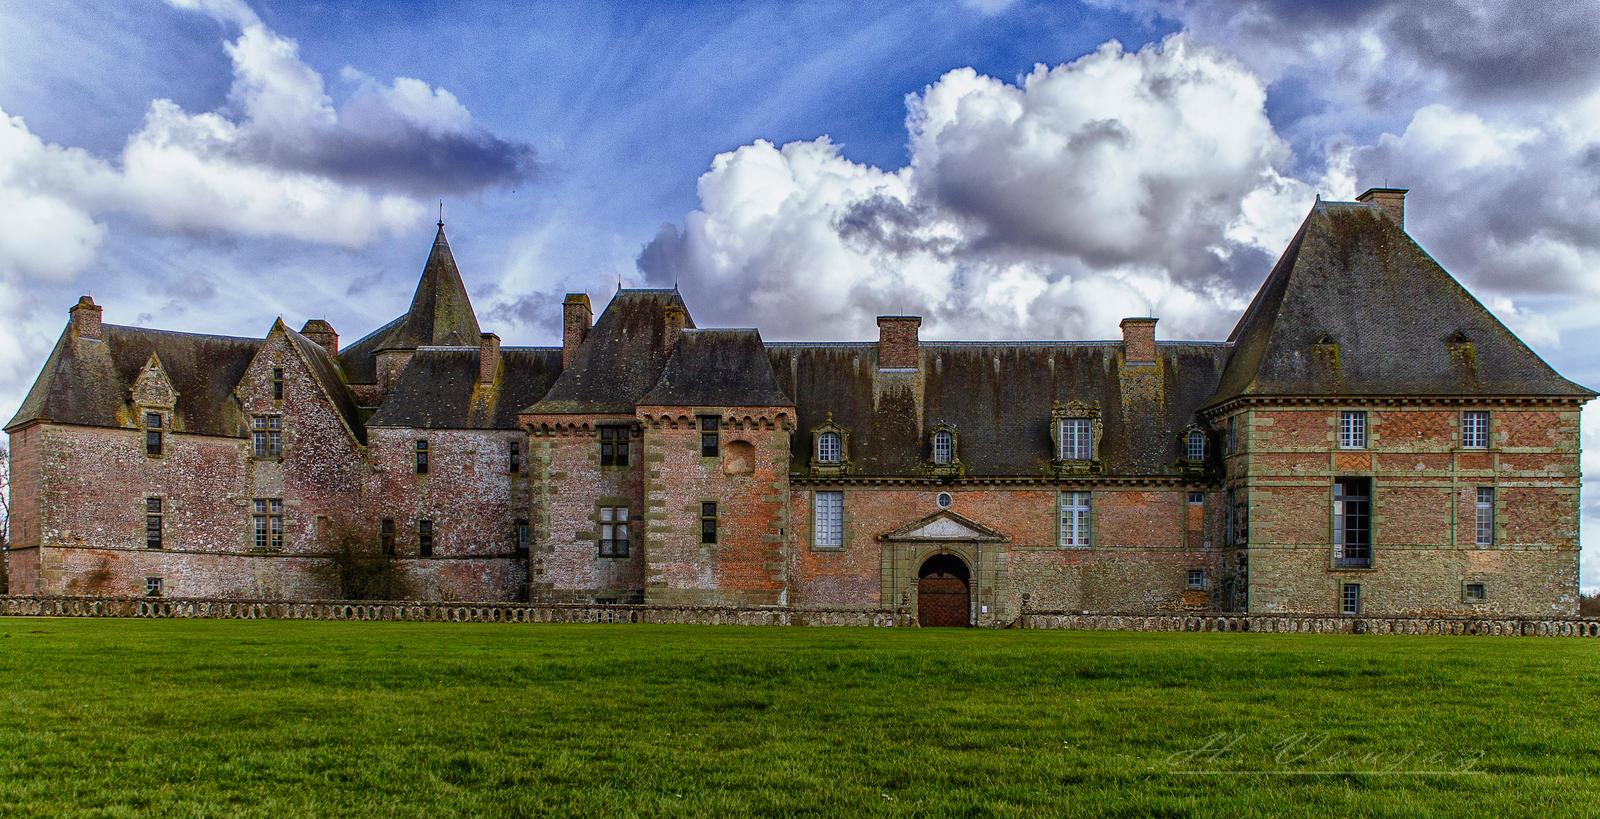 Castle of Carrouge Orne France by hubert61